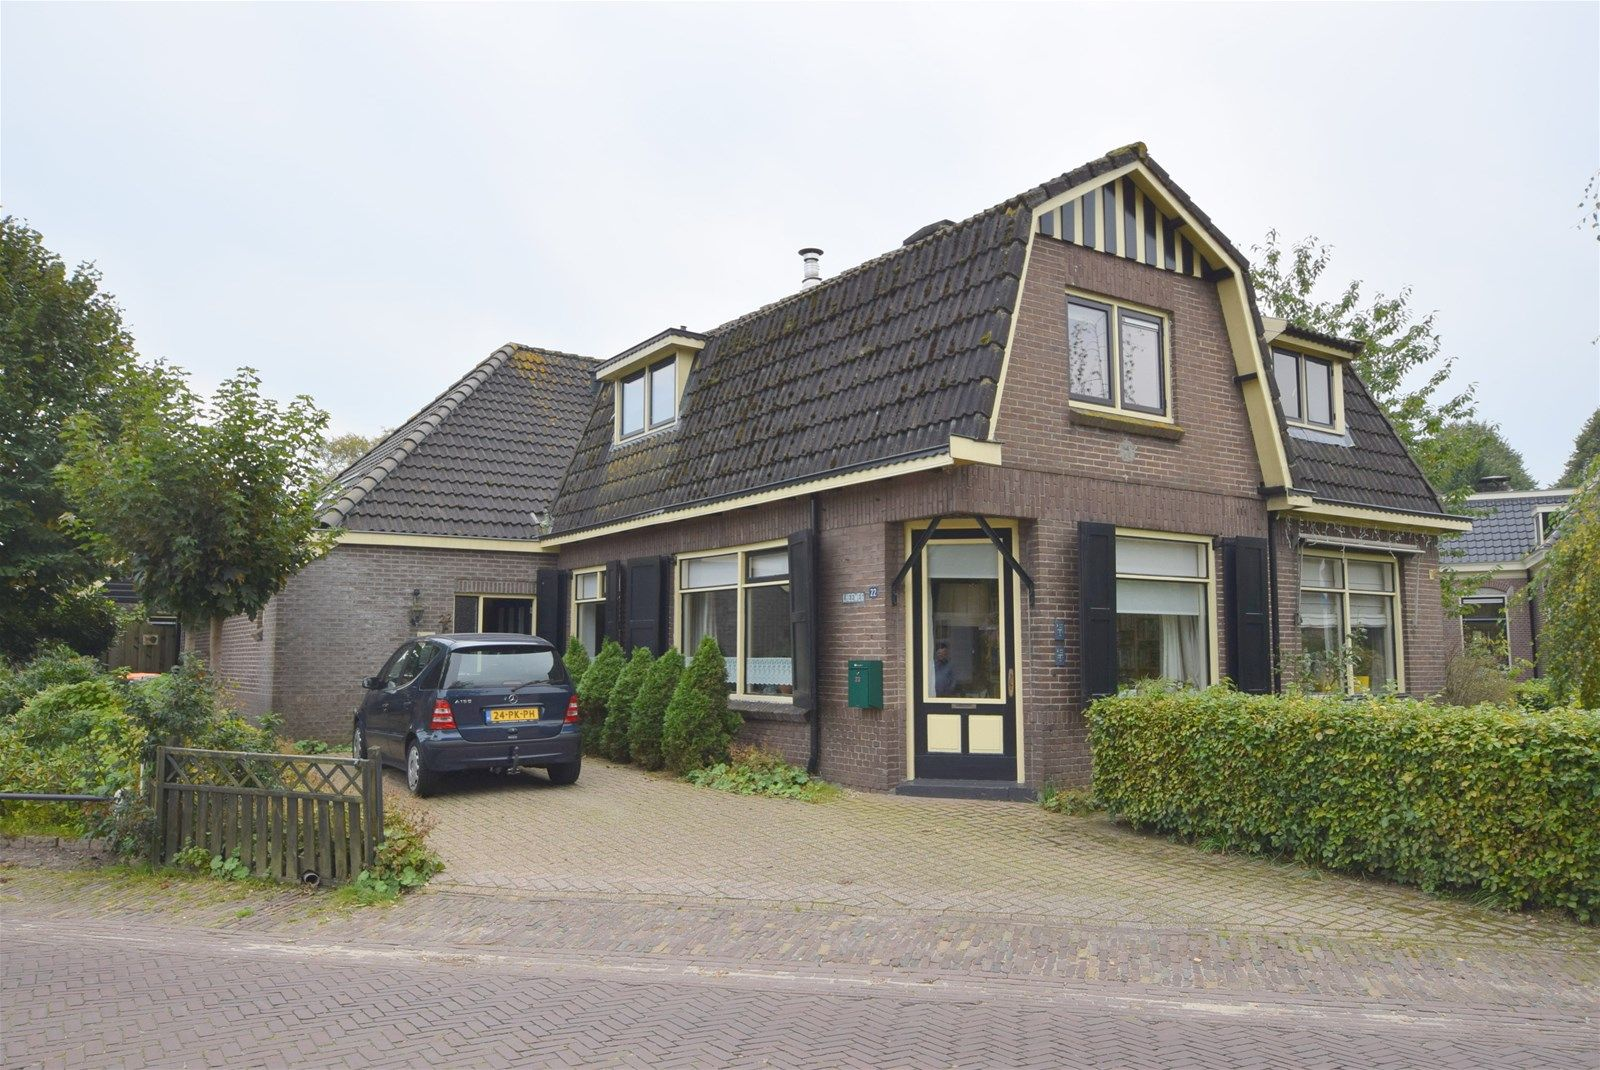 Lheeweg 22, Dwingeloo